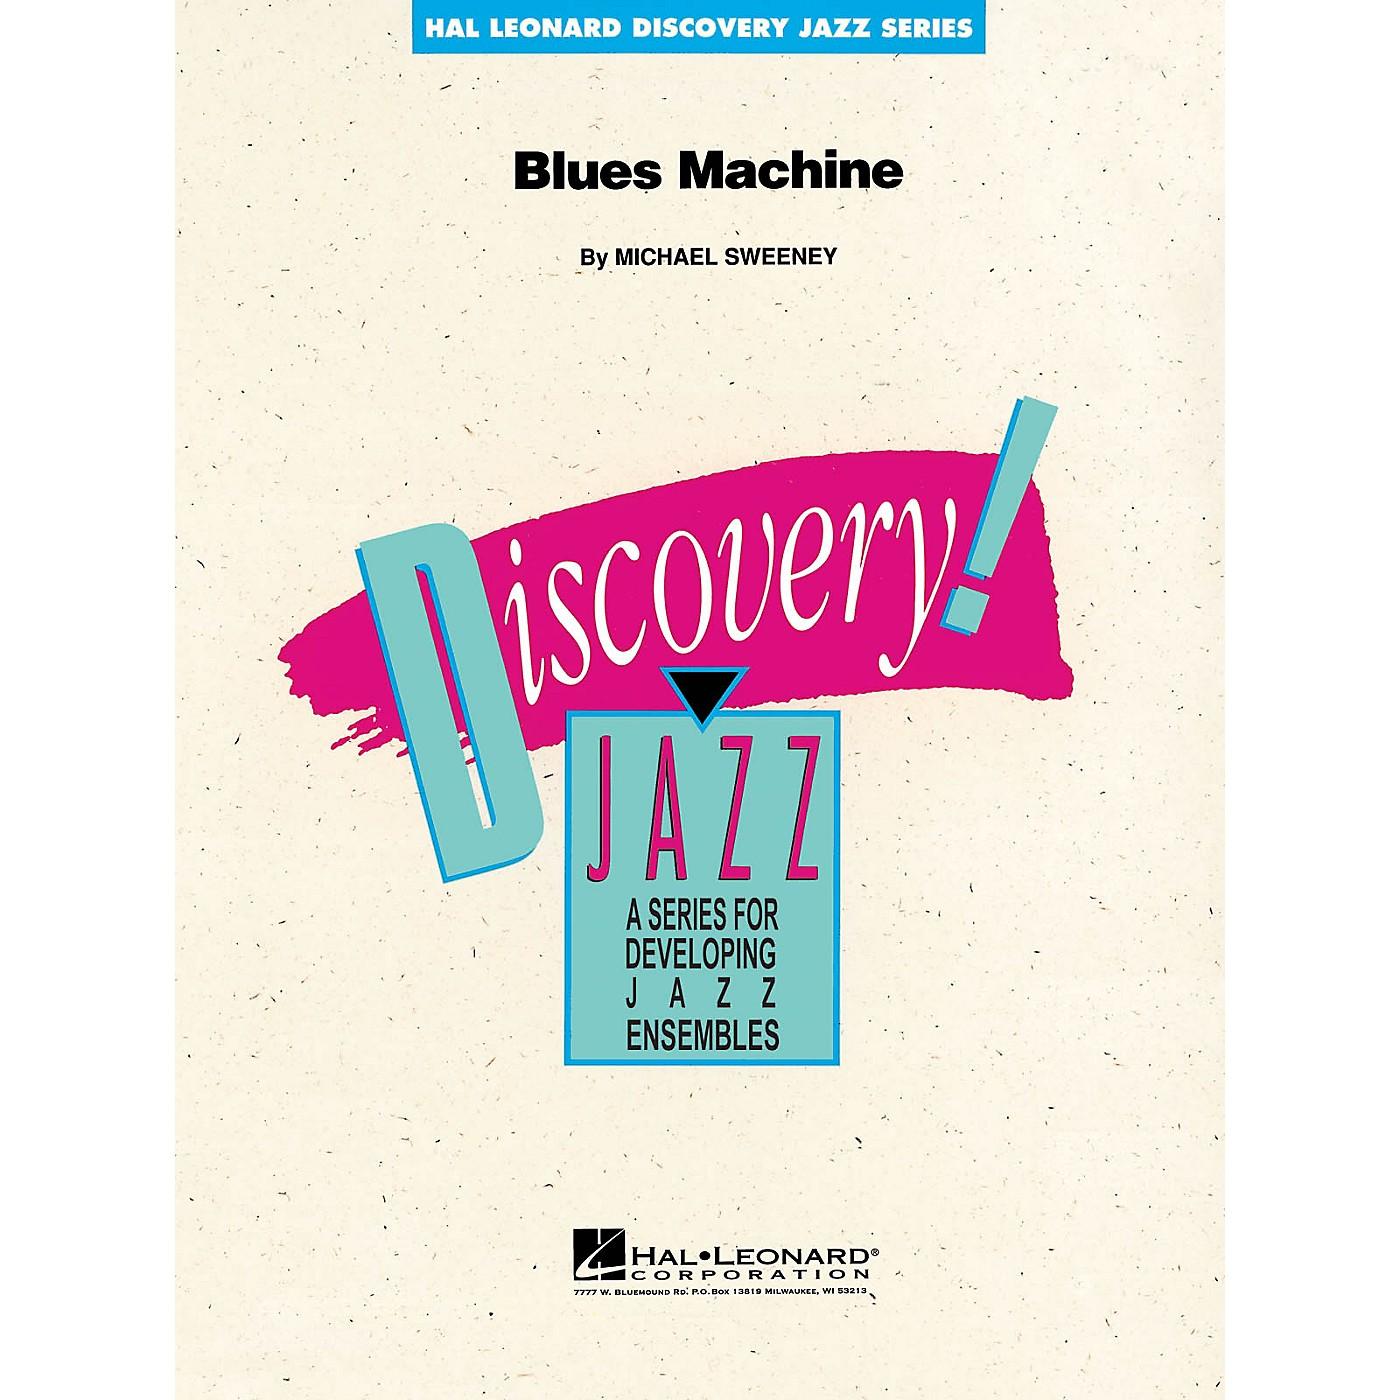 Hal Leonard Blues Machine Jazz Band Level 1-2 Composed by Michael Sweeney thumbnail